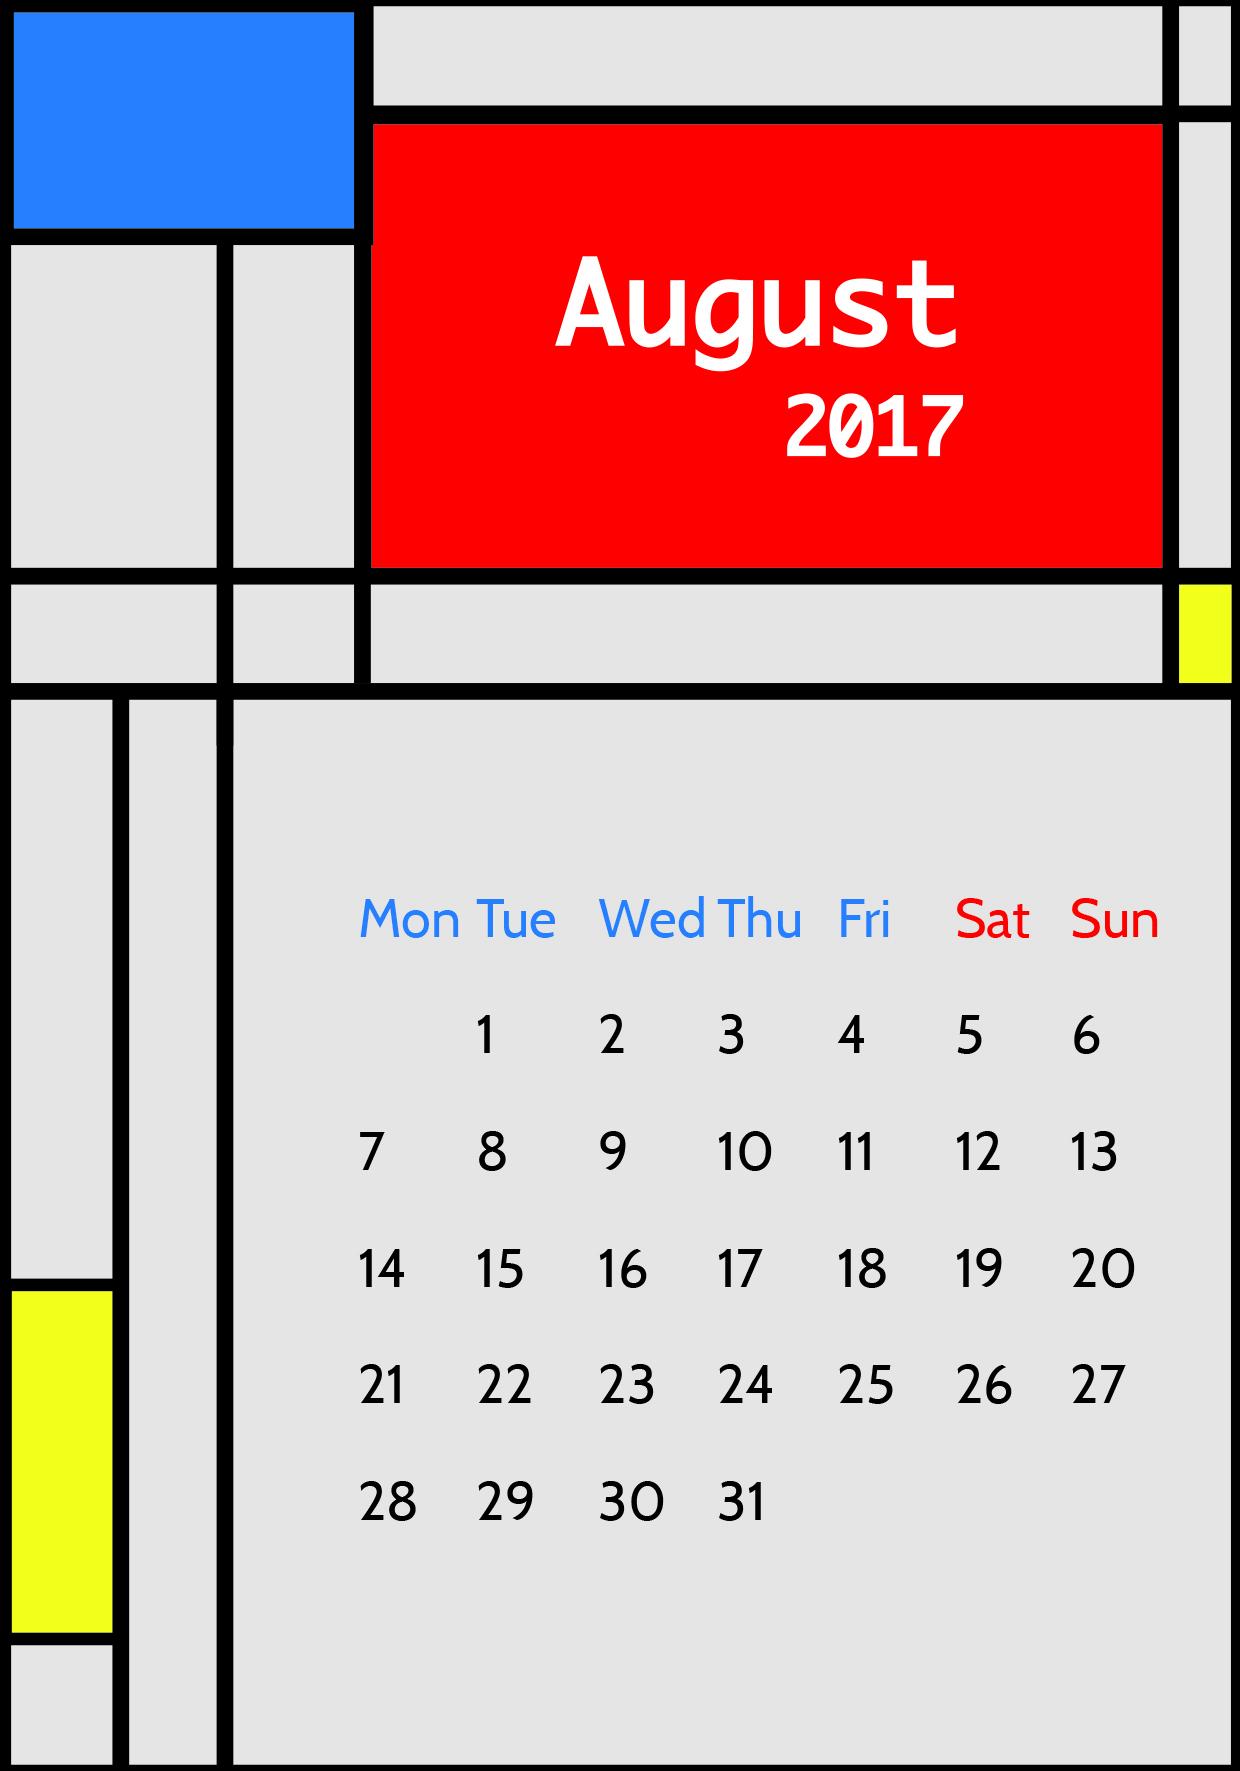 Aug 2017